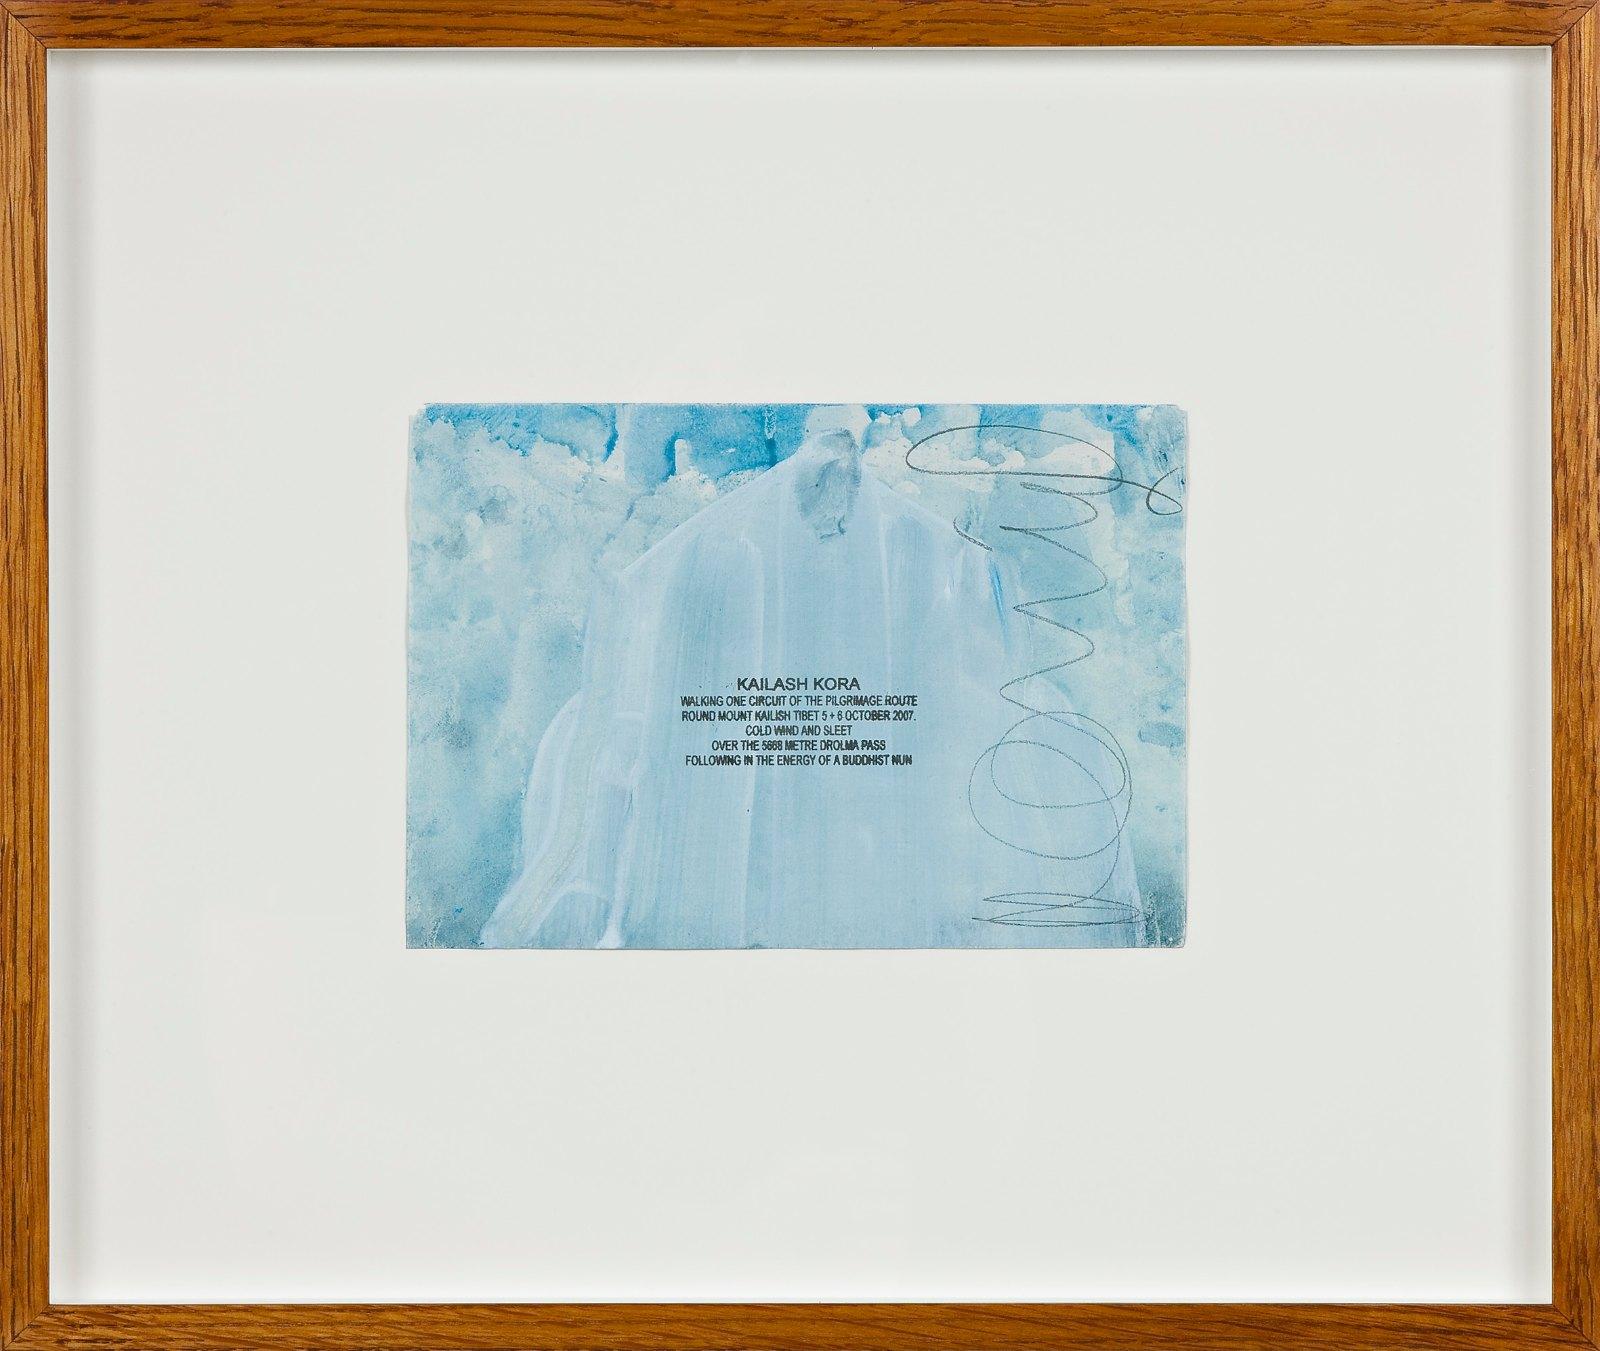 Kailash Kora, 2007, ink walk text on acrylic in artist frame, 14.5 x 20.5 cm